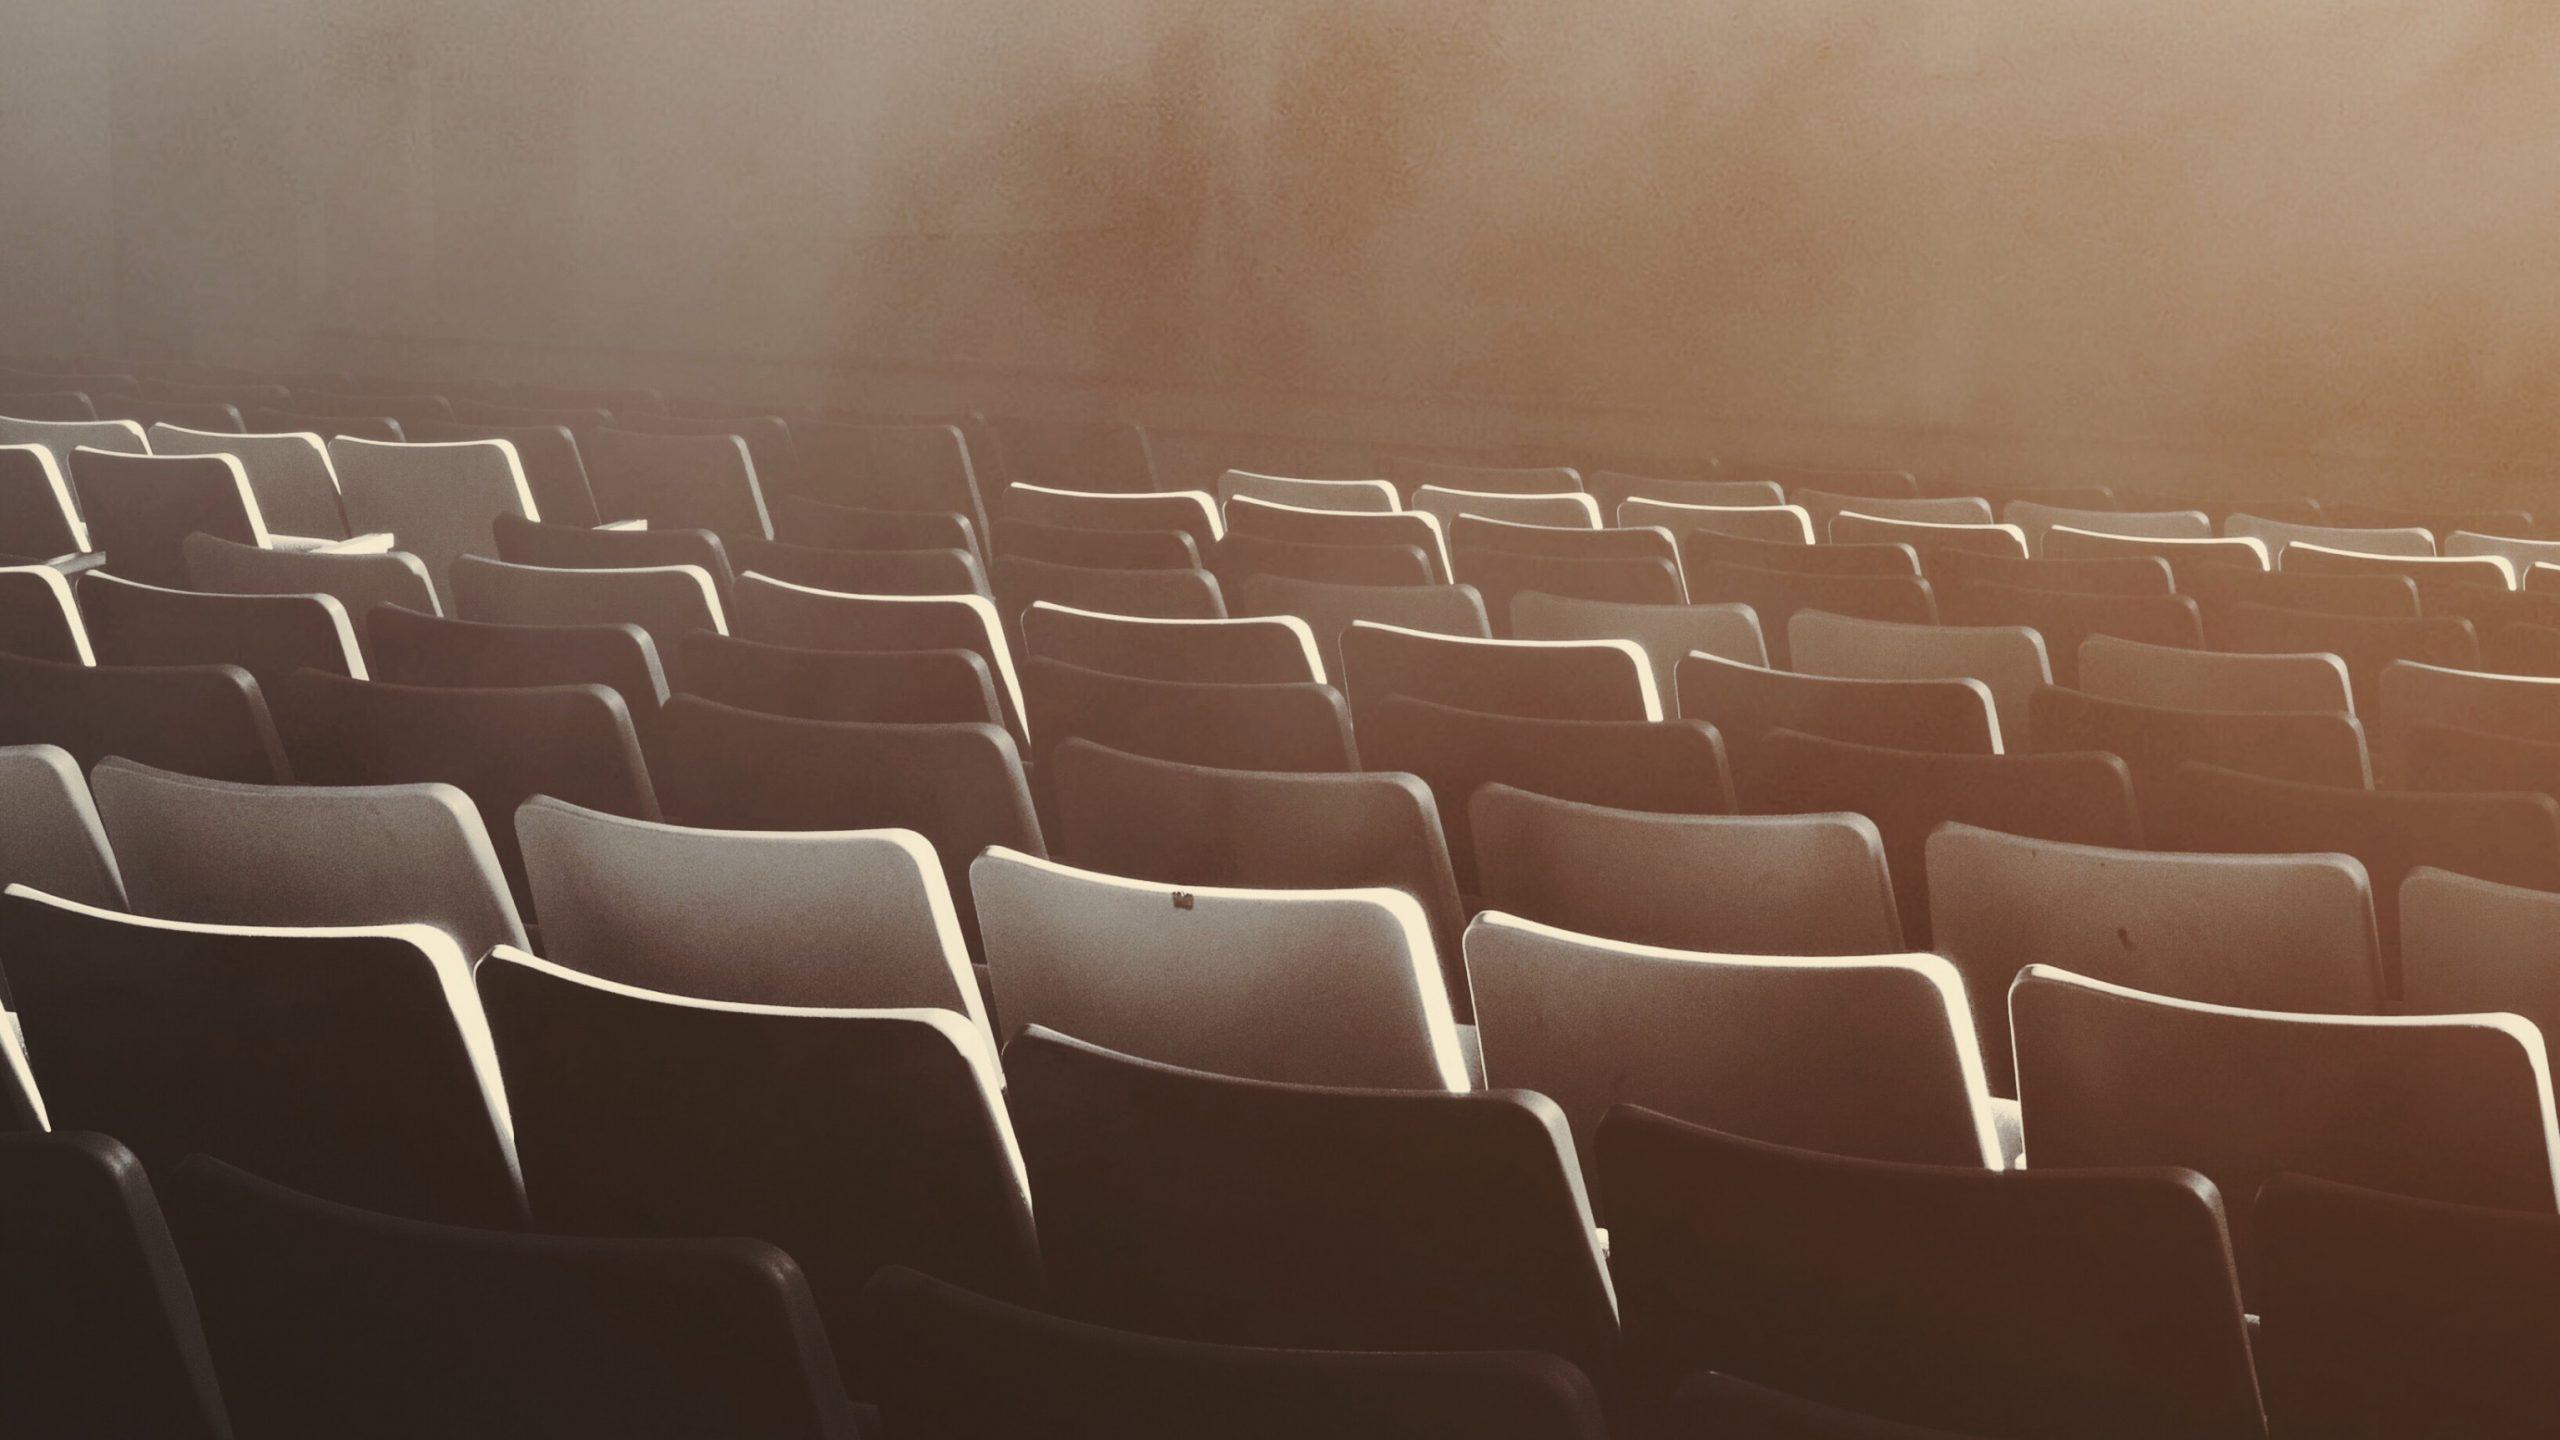 Watching Films to Learn Filmmaking